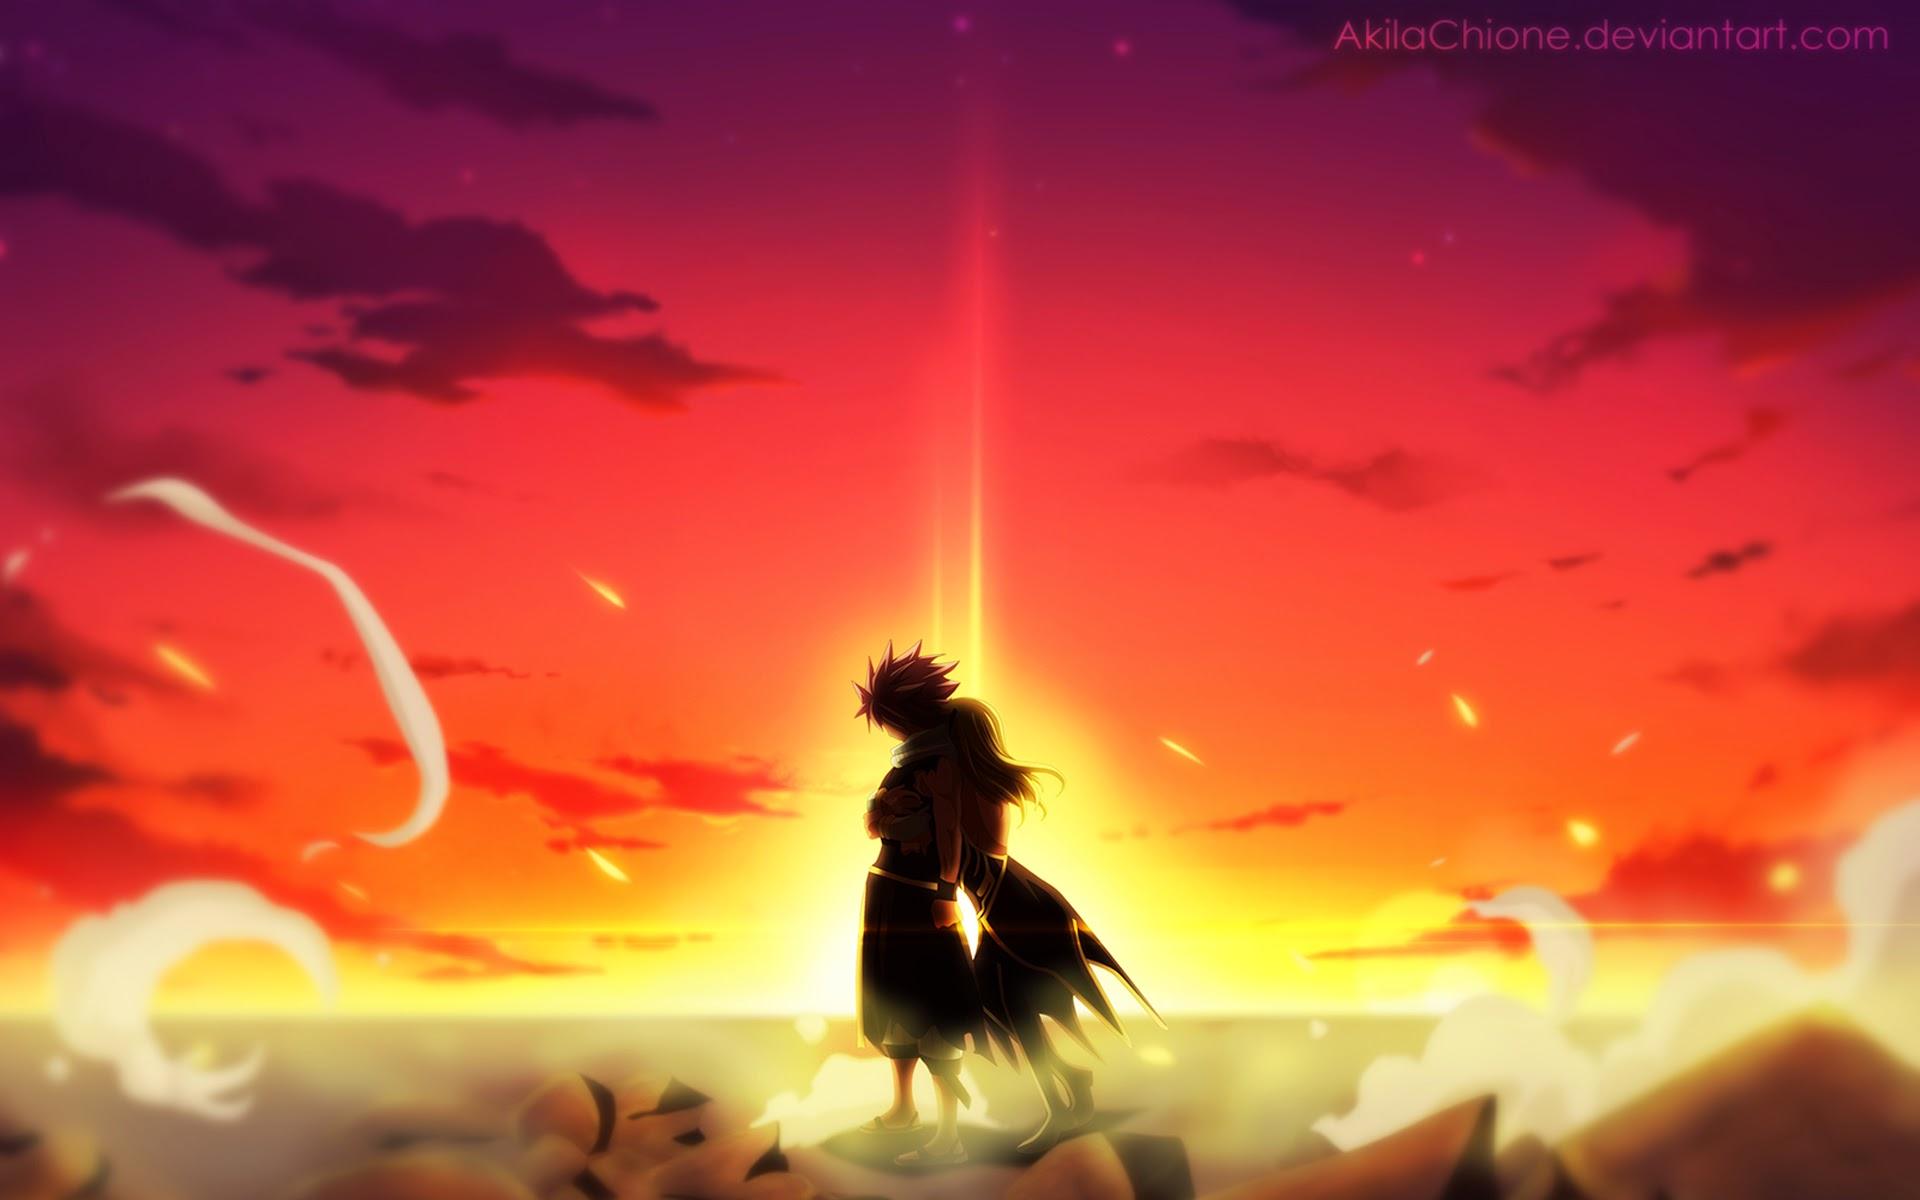 natsu lucy hug sunset fairy tail anime hd wallpaper 1920x1200 b025 1920x1200